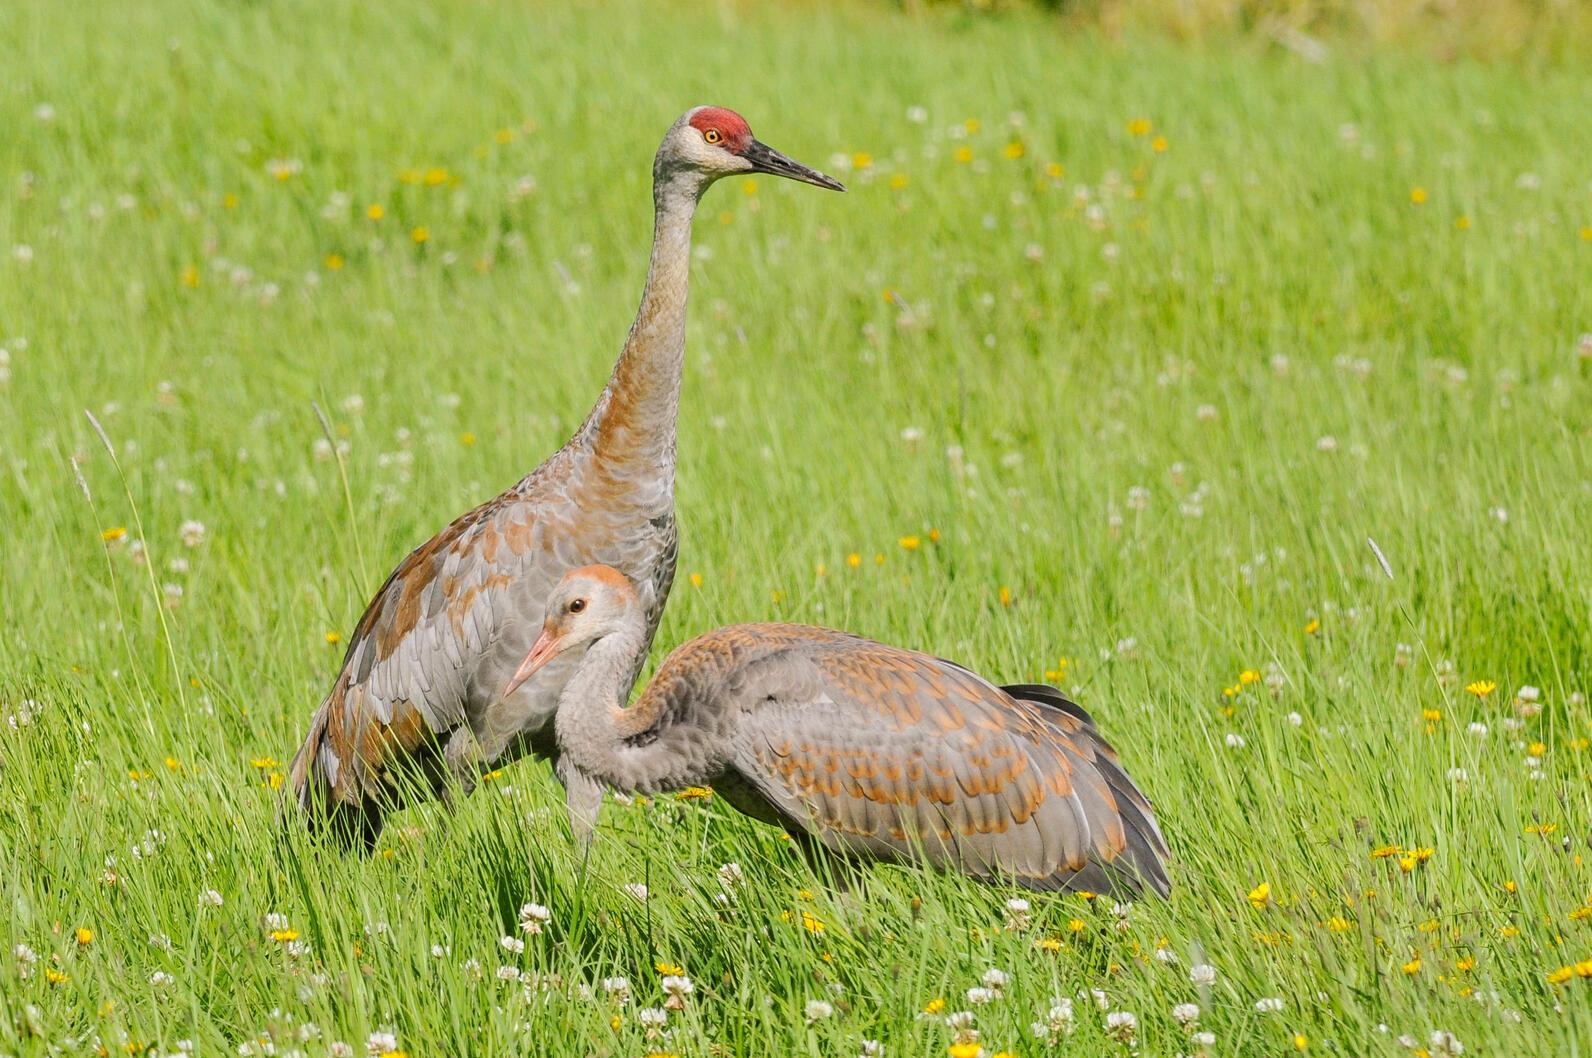 Ambler Road threaten the future of Sandhill Cranes.